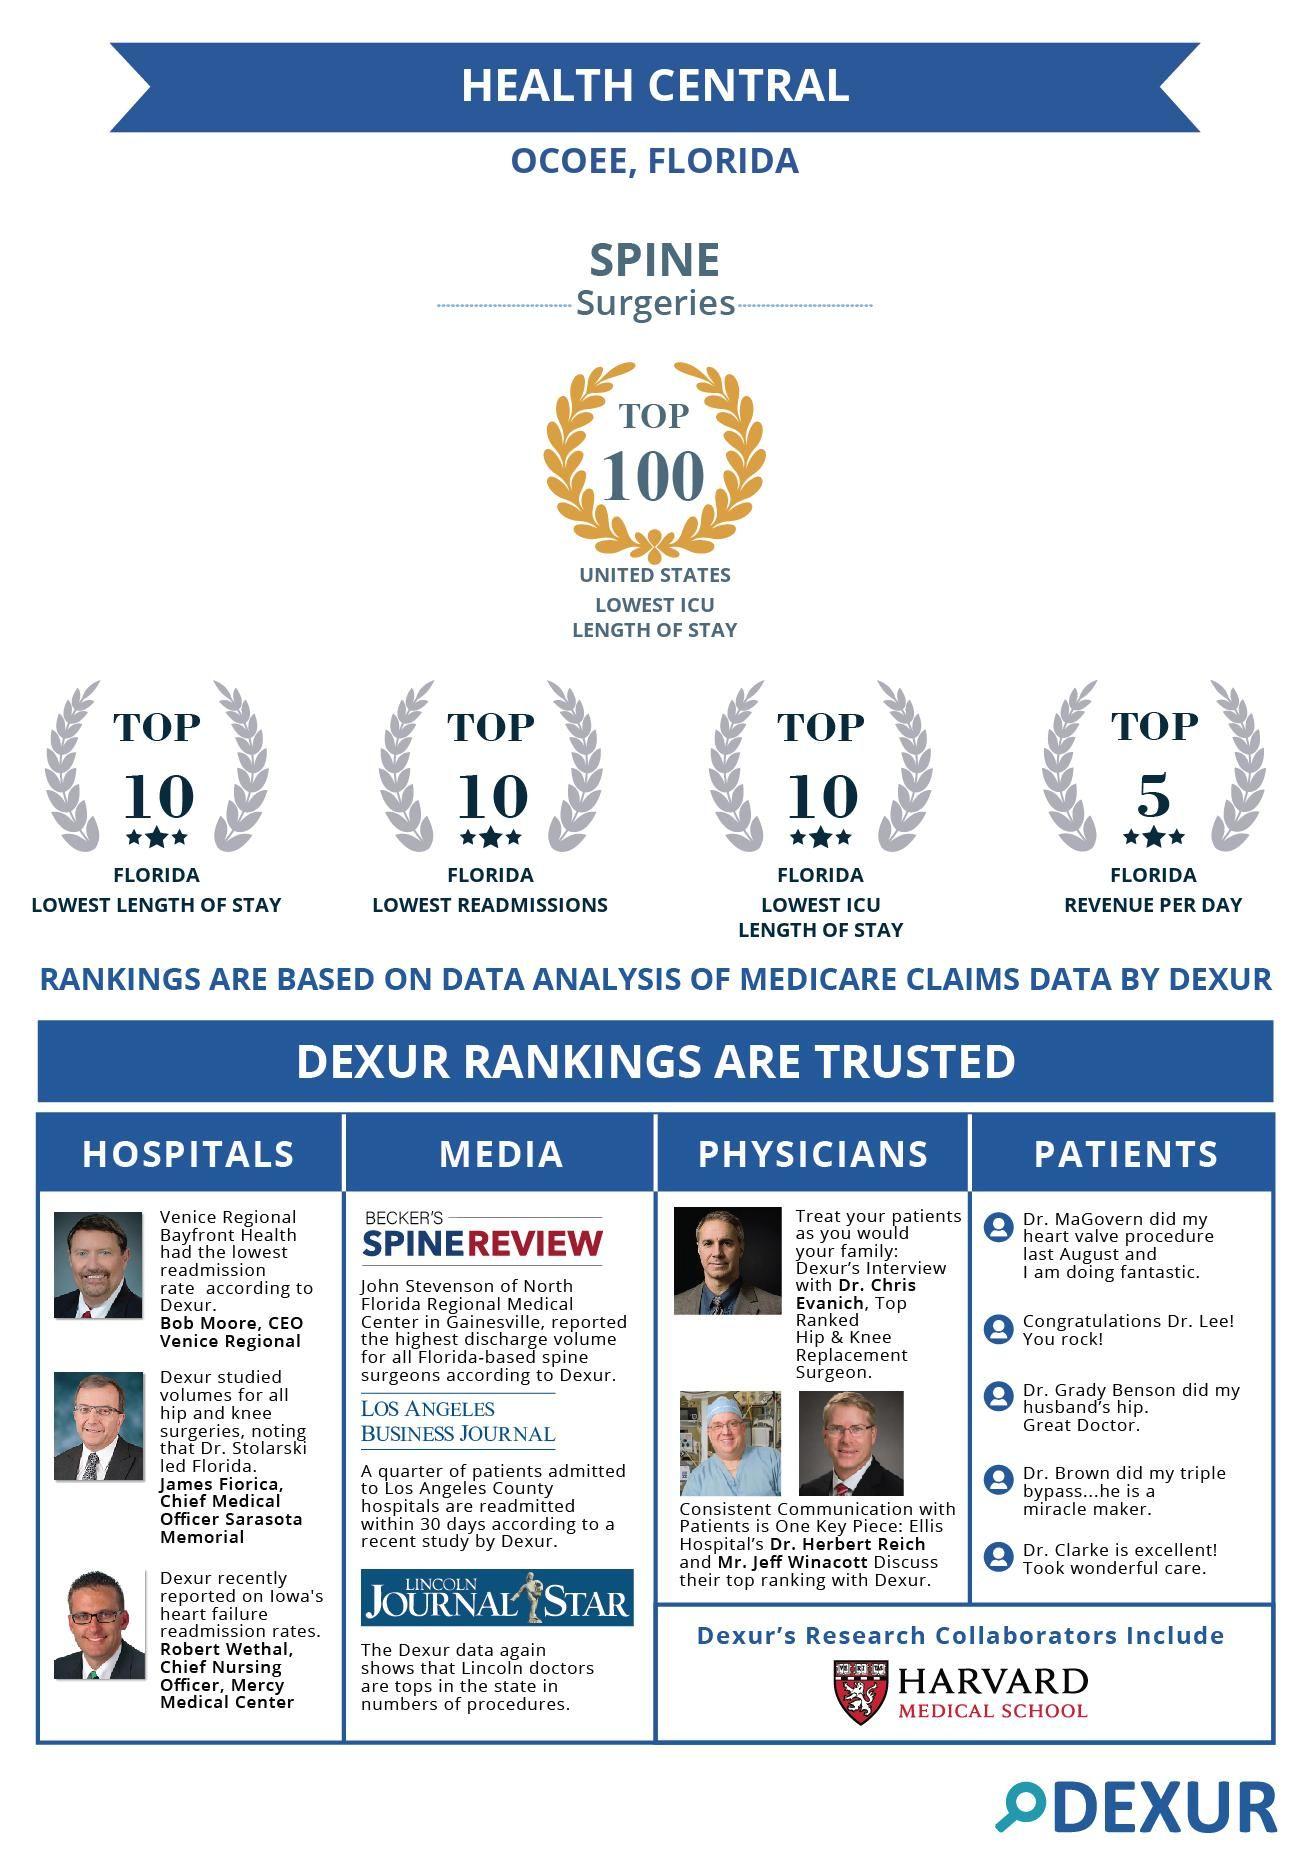 Health central ocoee fl top ranked hospital for spine